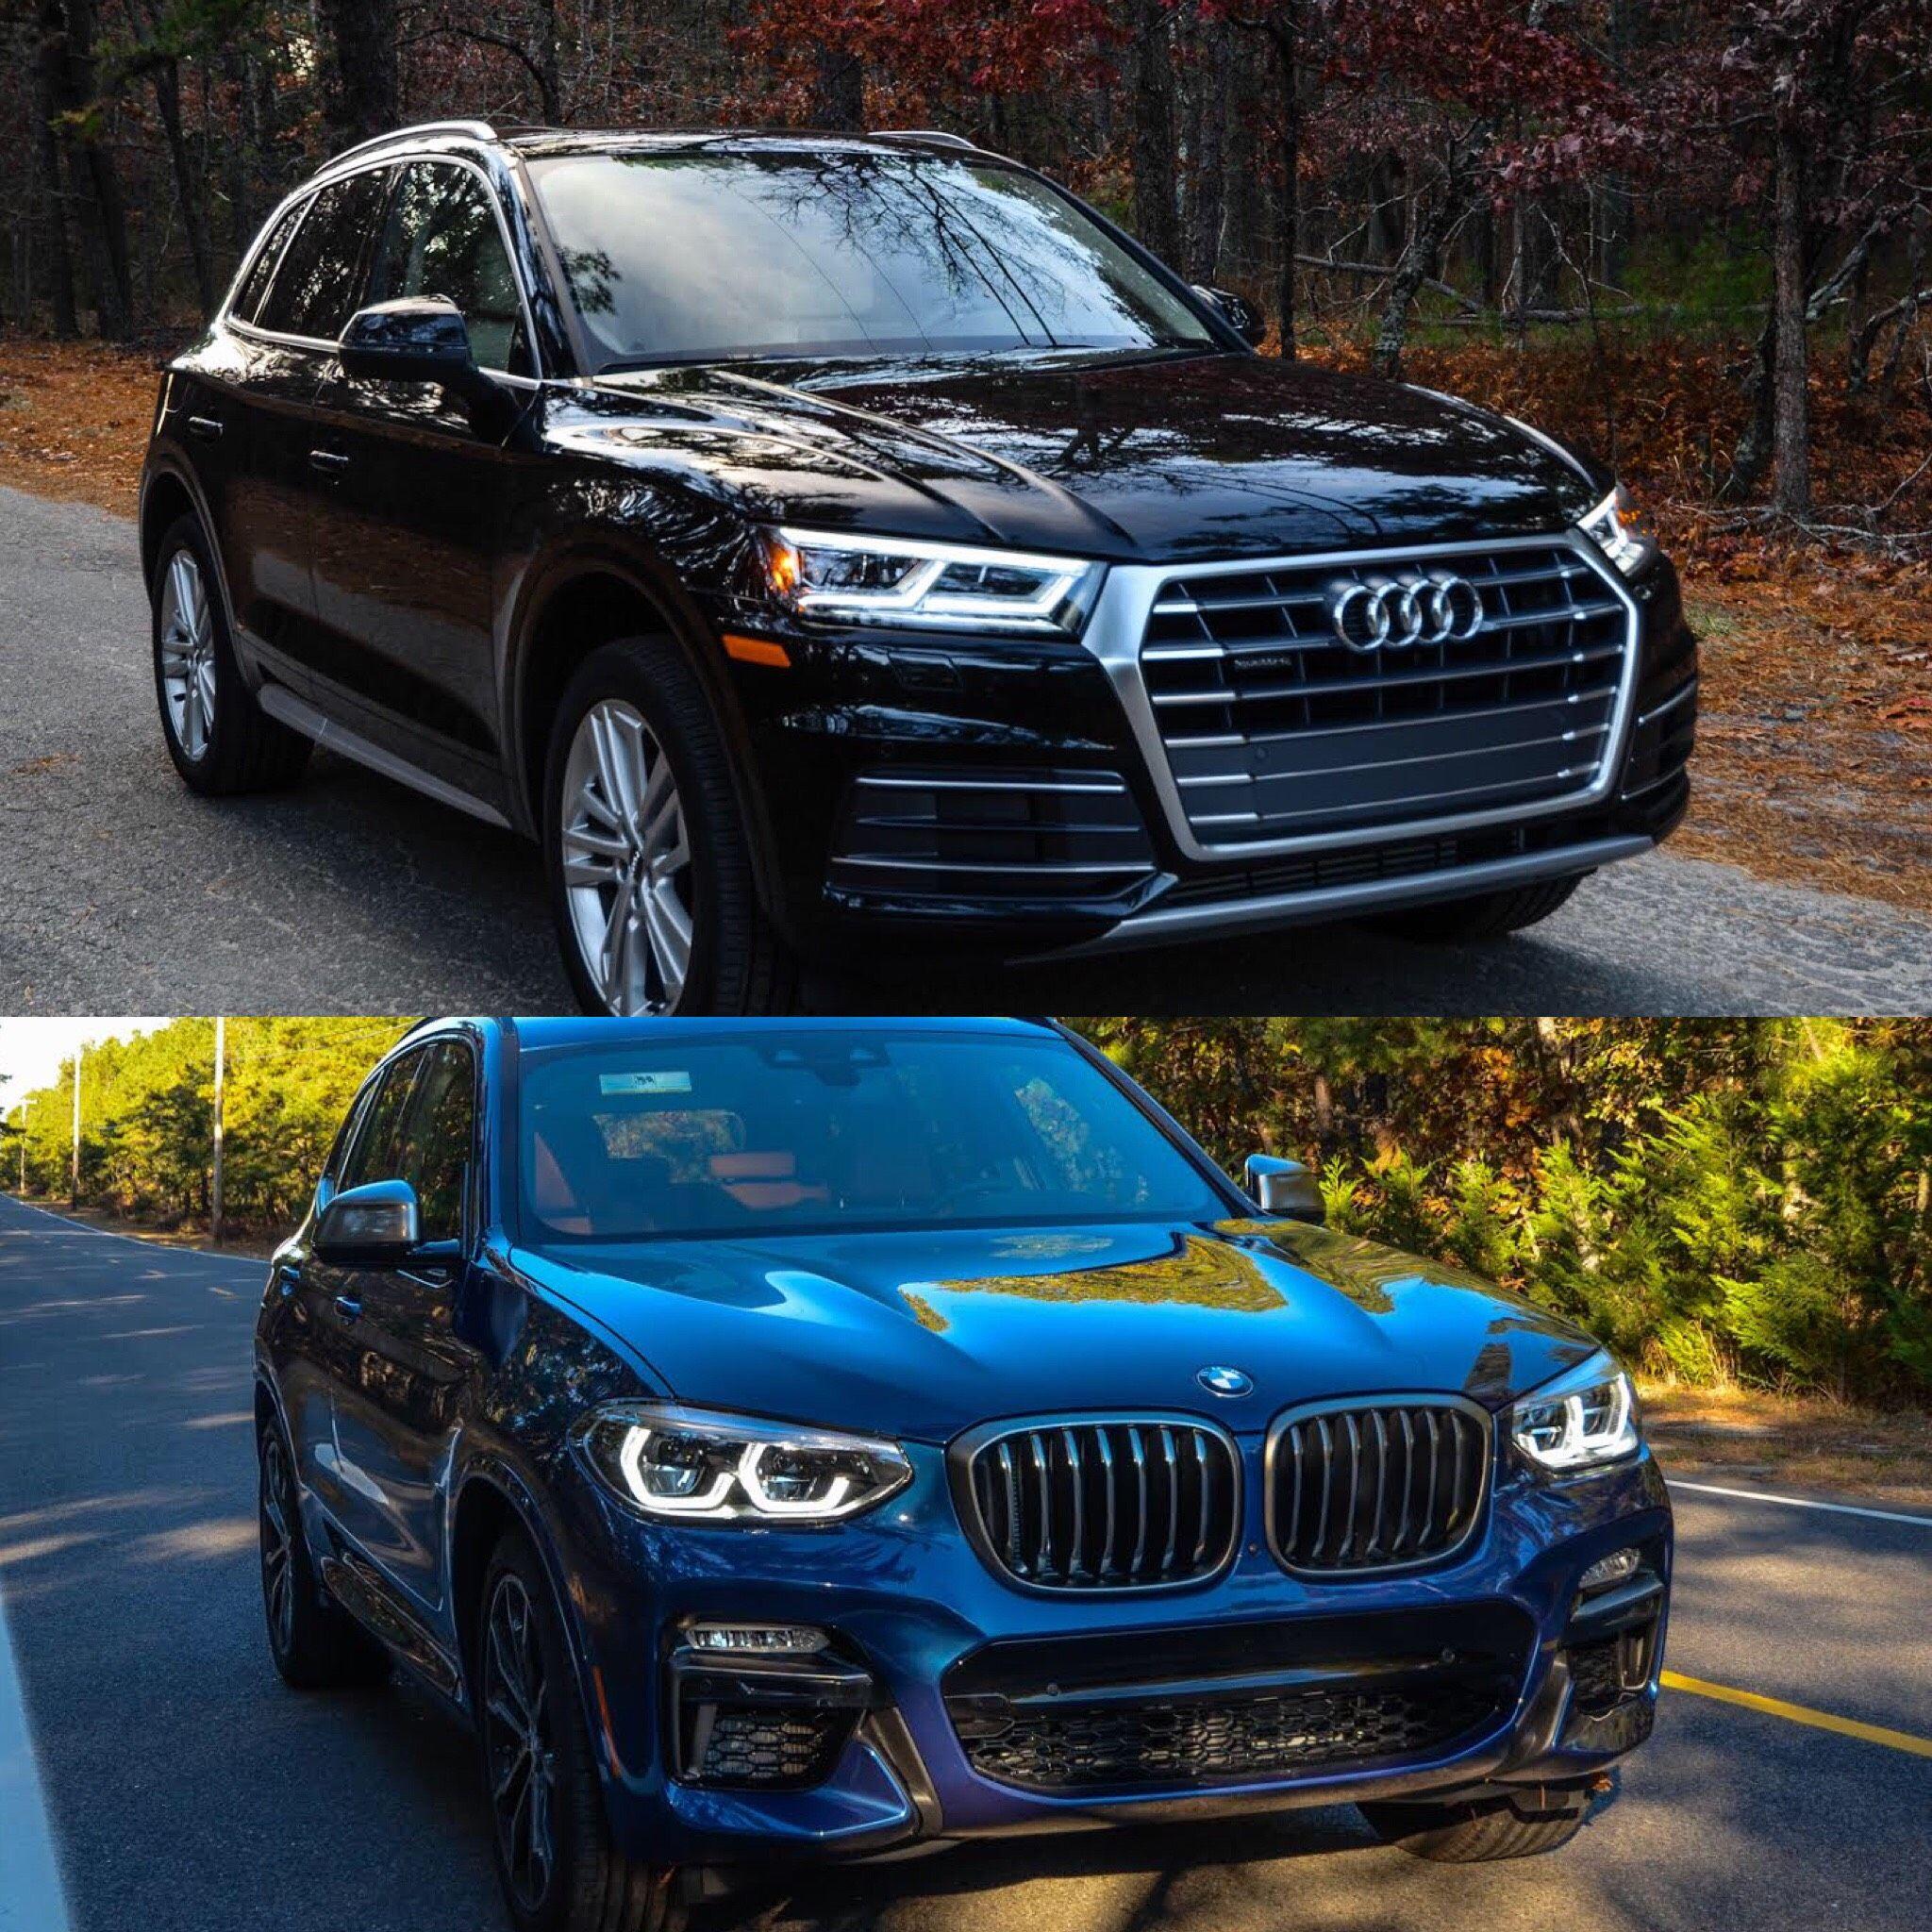 Photo Comparison Audi Q Vs BMW X Audi Pinterest - Ray catena audi